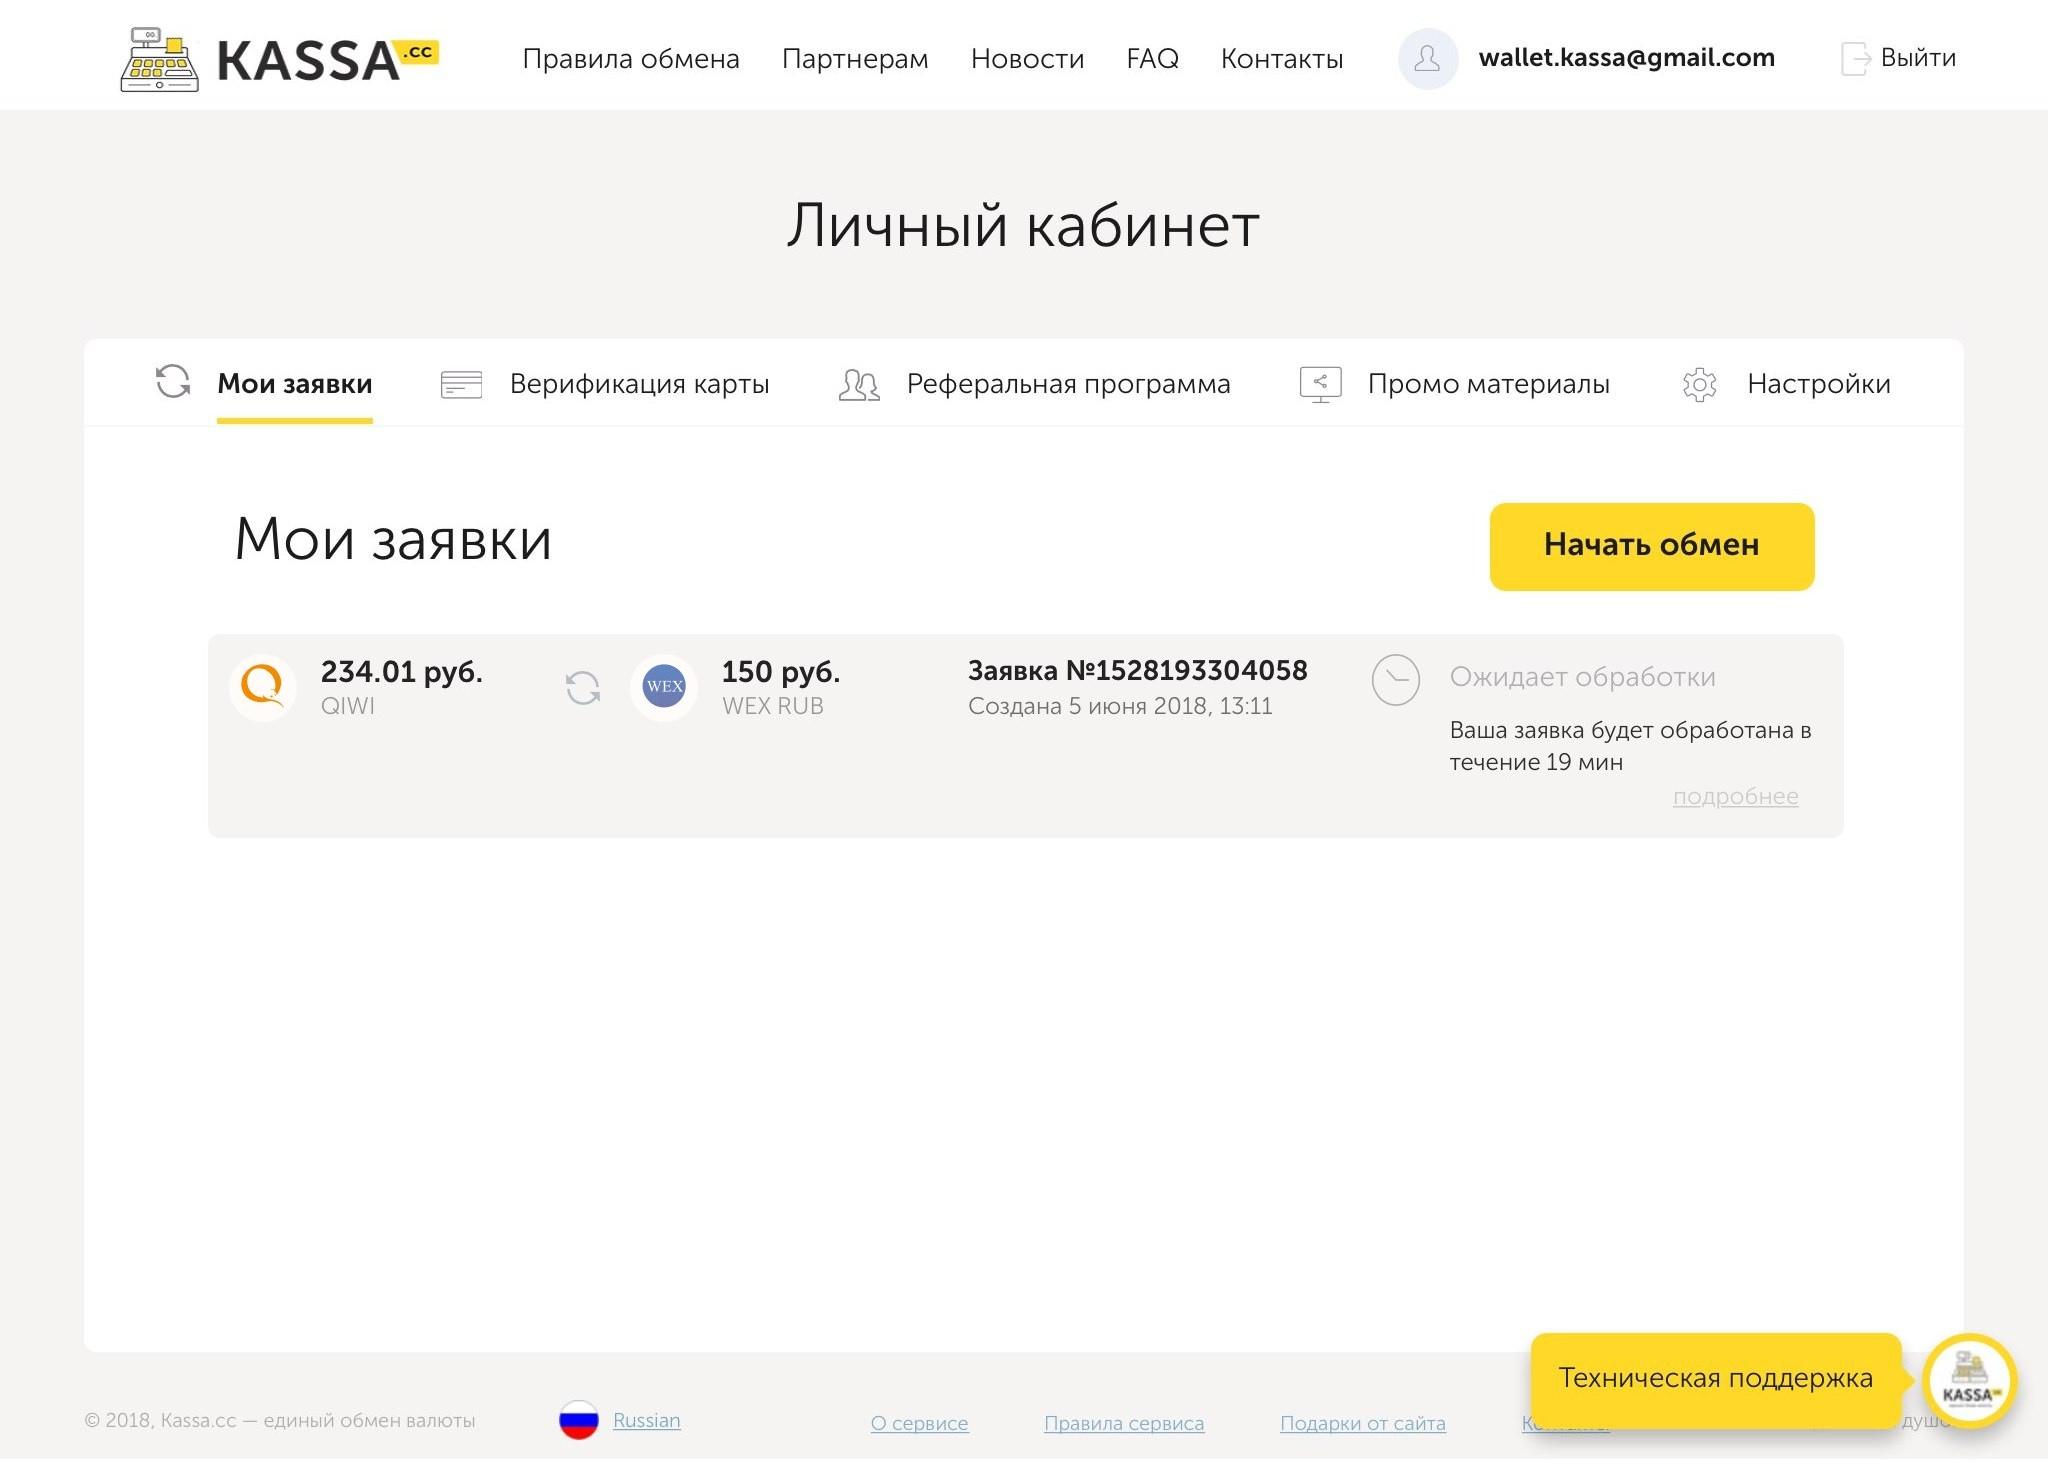 Kassa.cc - единый обмен валюты. Обмен QIWI RUB на BTC-e RUB